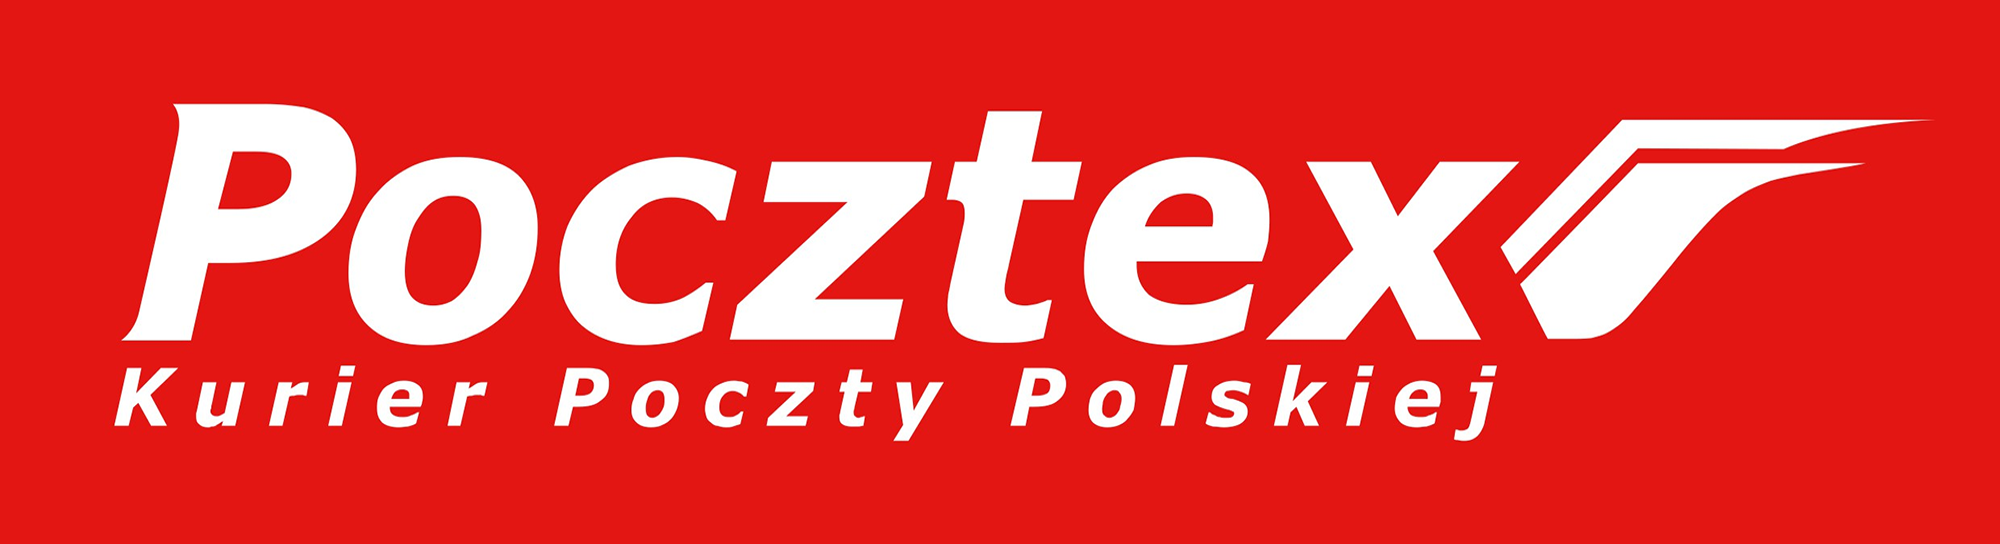 Pocztex Kurier